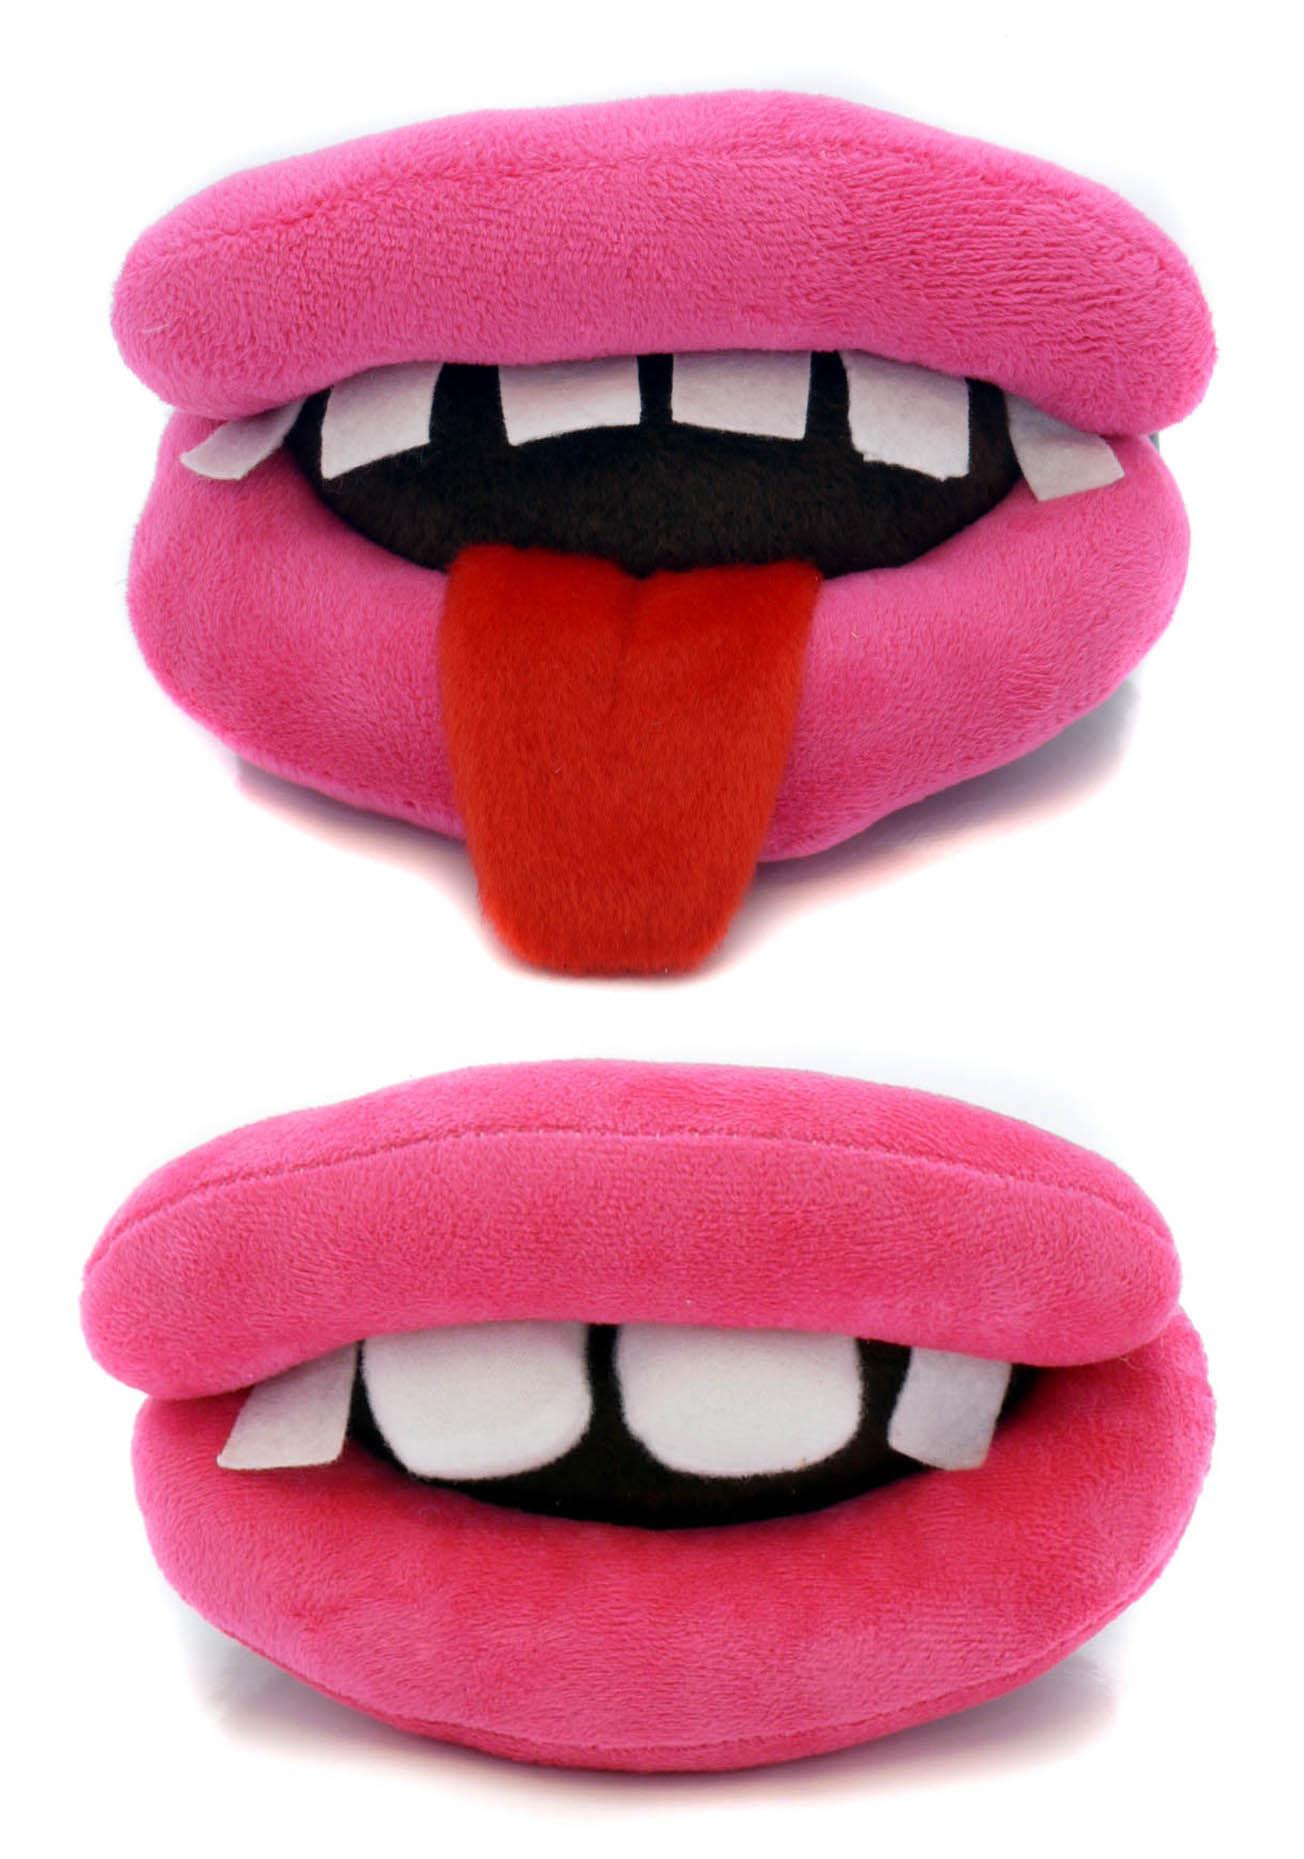 Lip Dog Toys : Ancol 🐶 dog lips plush squeaker toy